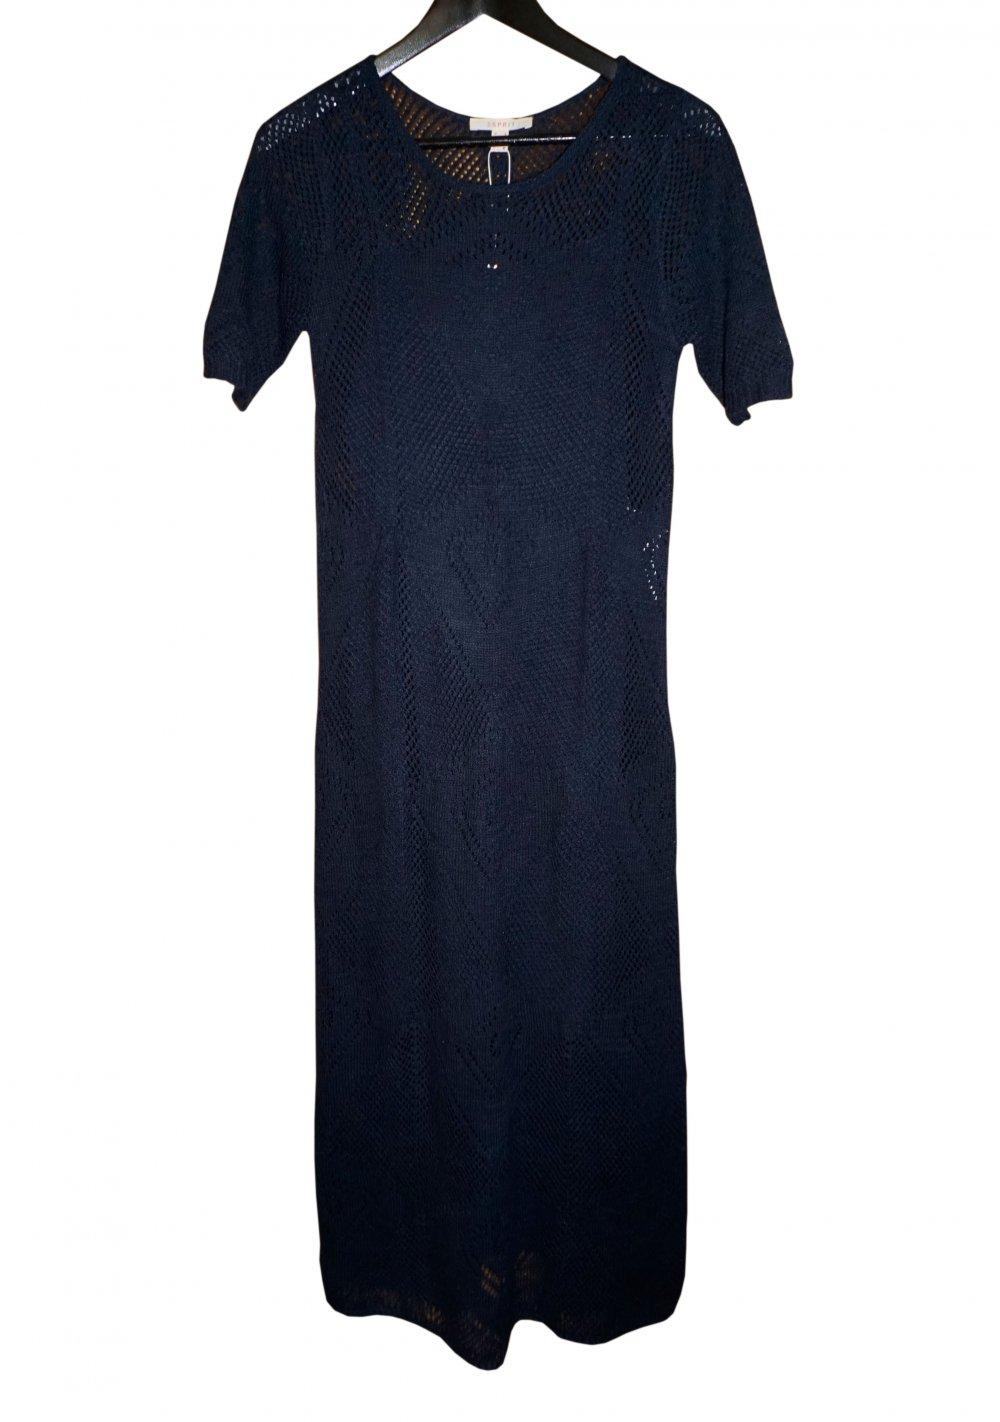 Esprit Kleid Strickkleid Sommerkleid GR. S 36 blau ...